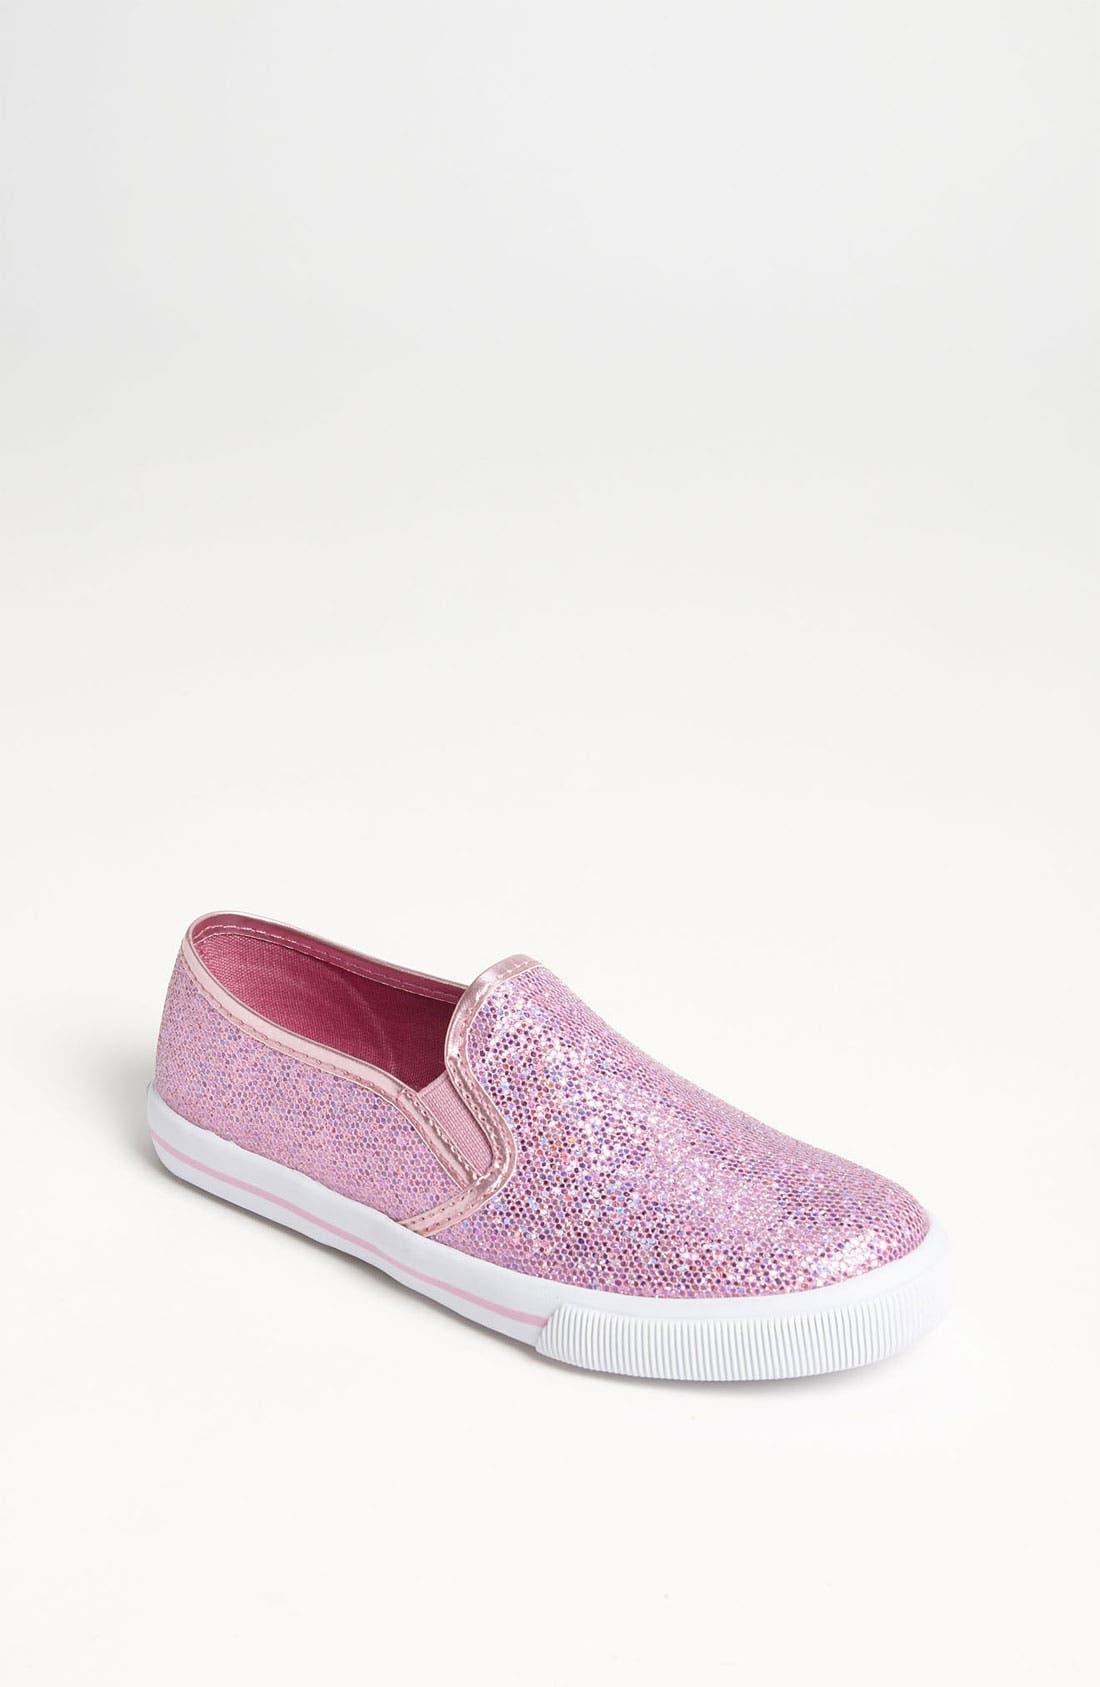 Main Image - Nina 'Havanie' Slip-On Sneaker (Toddler, Little Kid & Big Kid)